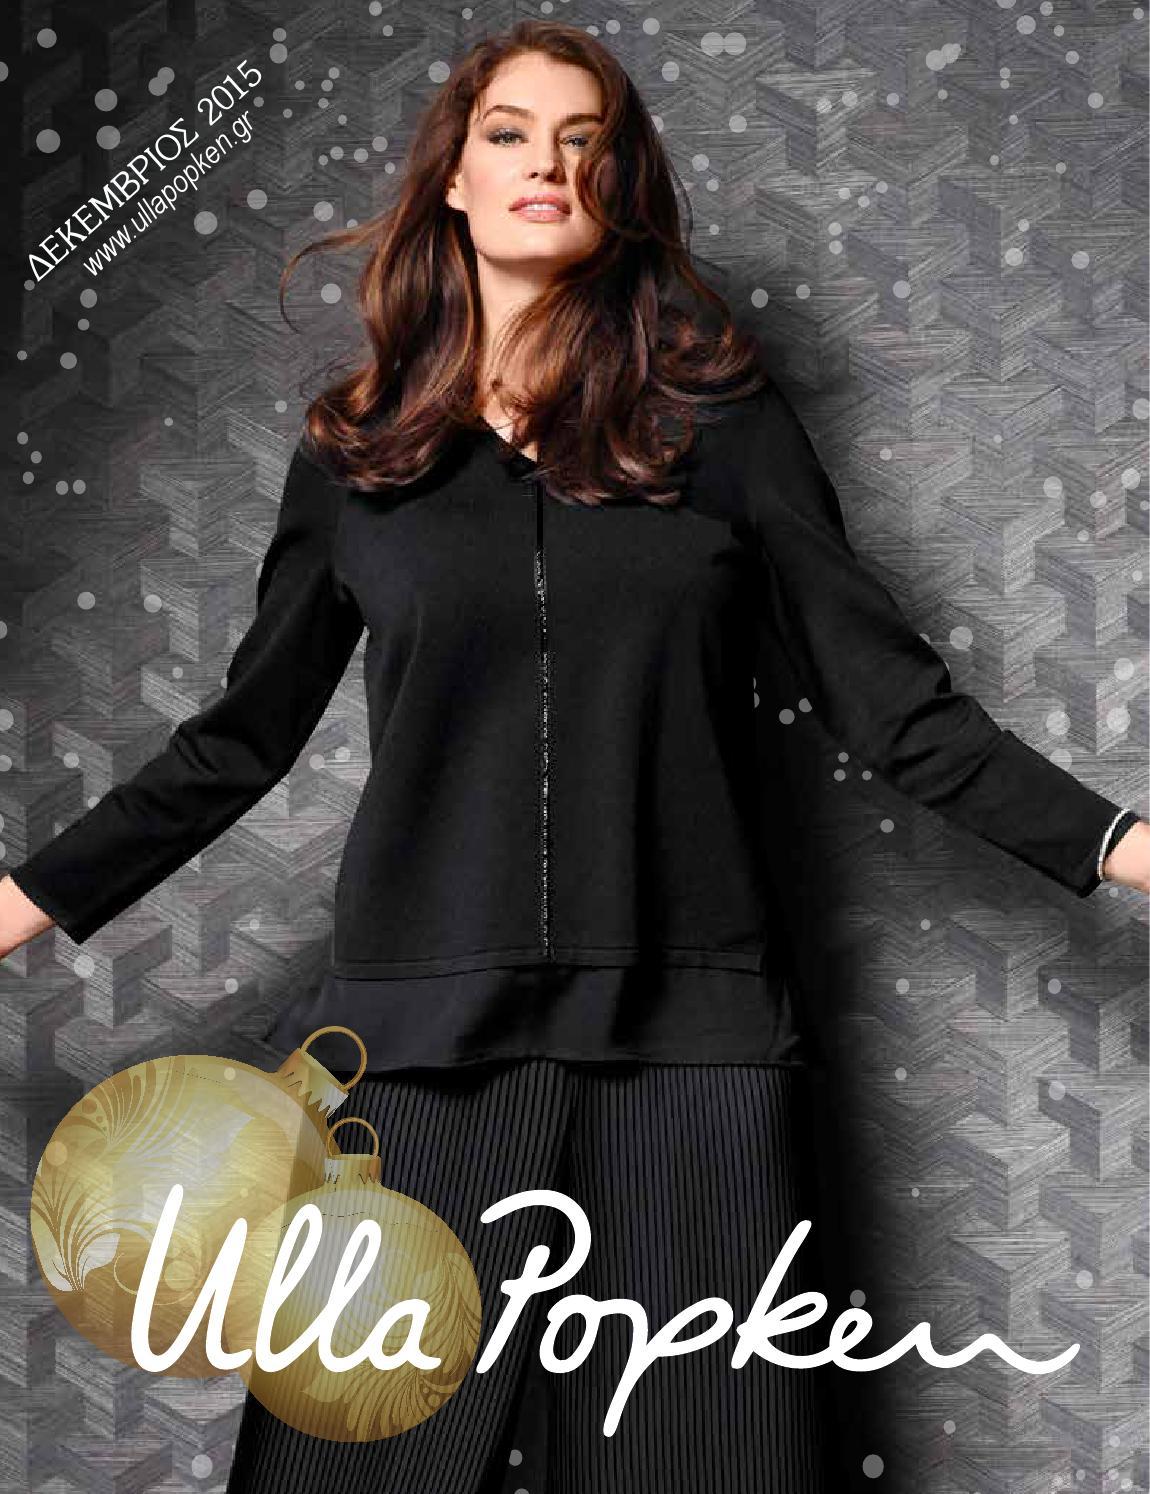 6a8814024bcc Ulla Popken December 2015 by Plus Size Fashion World - issuu